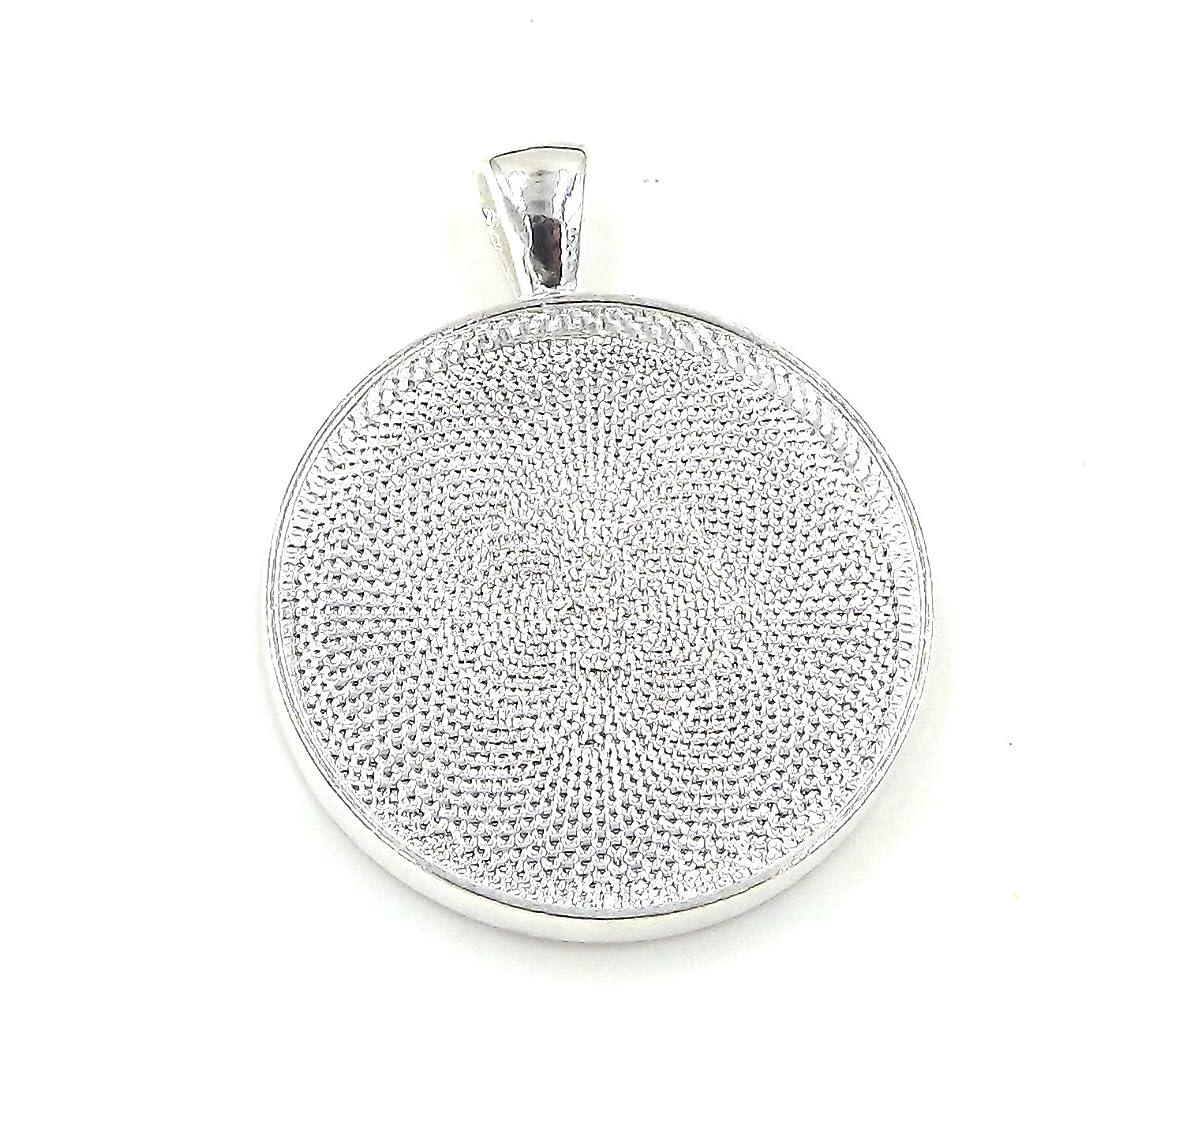 20 Deannassupplyshop Circle Pendant Trays - Silver Color - 30mm - Pendant Blanks Cameo Bezel Settings Photo Jewelry - Custom Jewelry Making